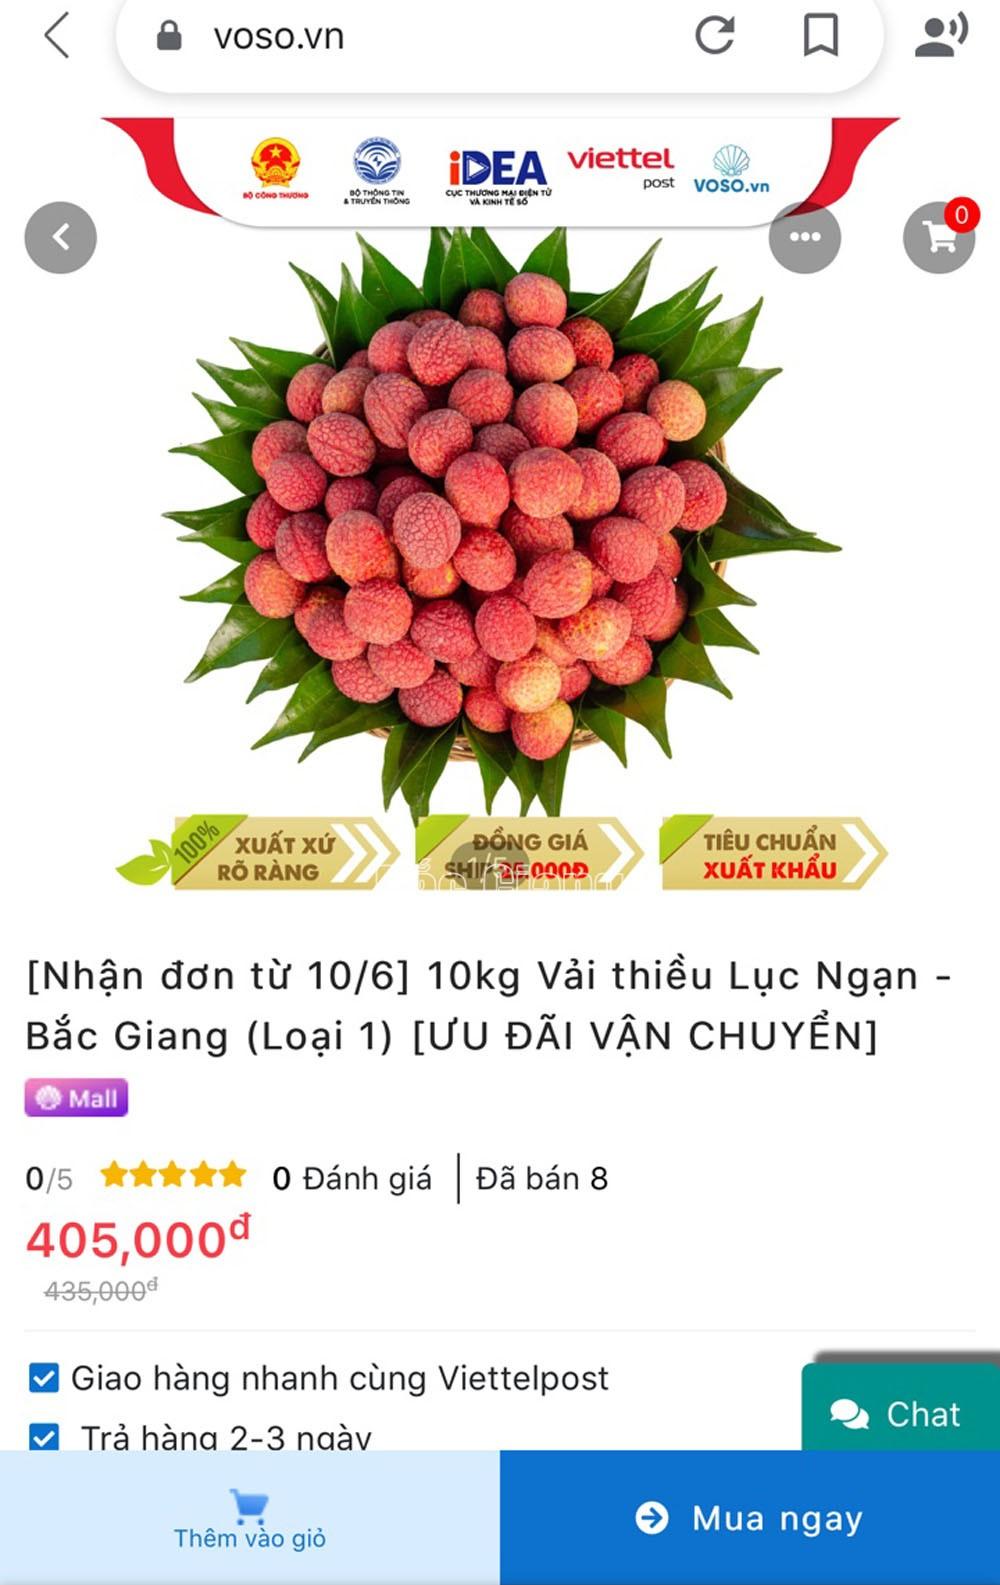 Nearly 50,000 tonnes, Bac Giang lychees, Bac Giang province, main season fruits, early ripening lychee, Covid-19 pandemic